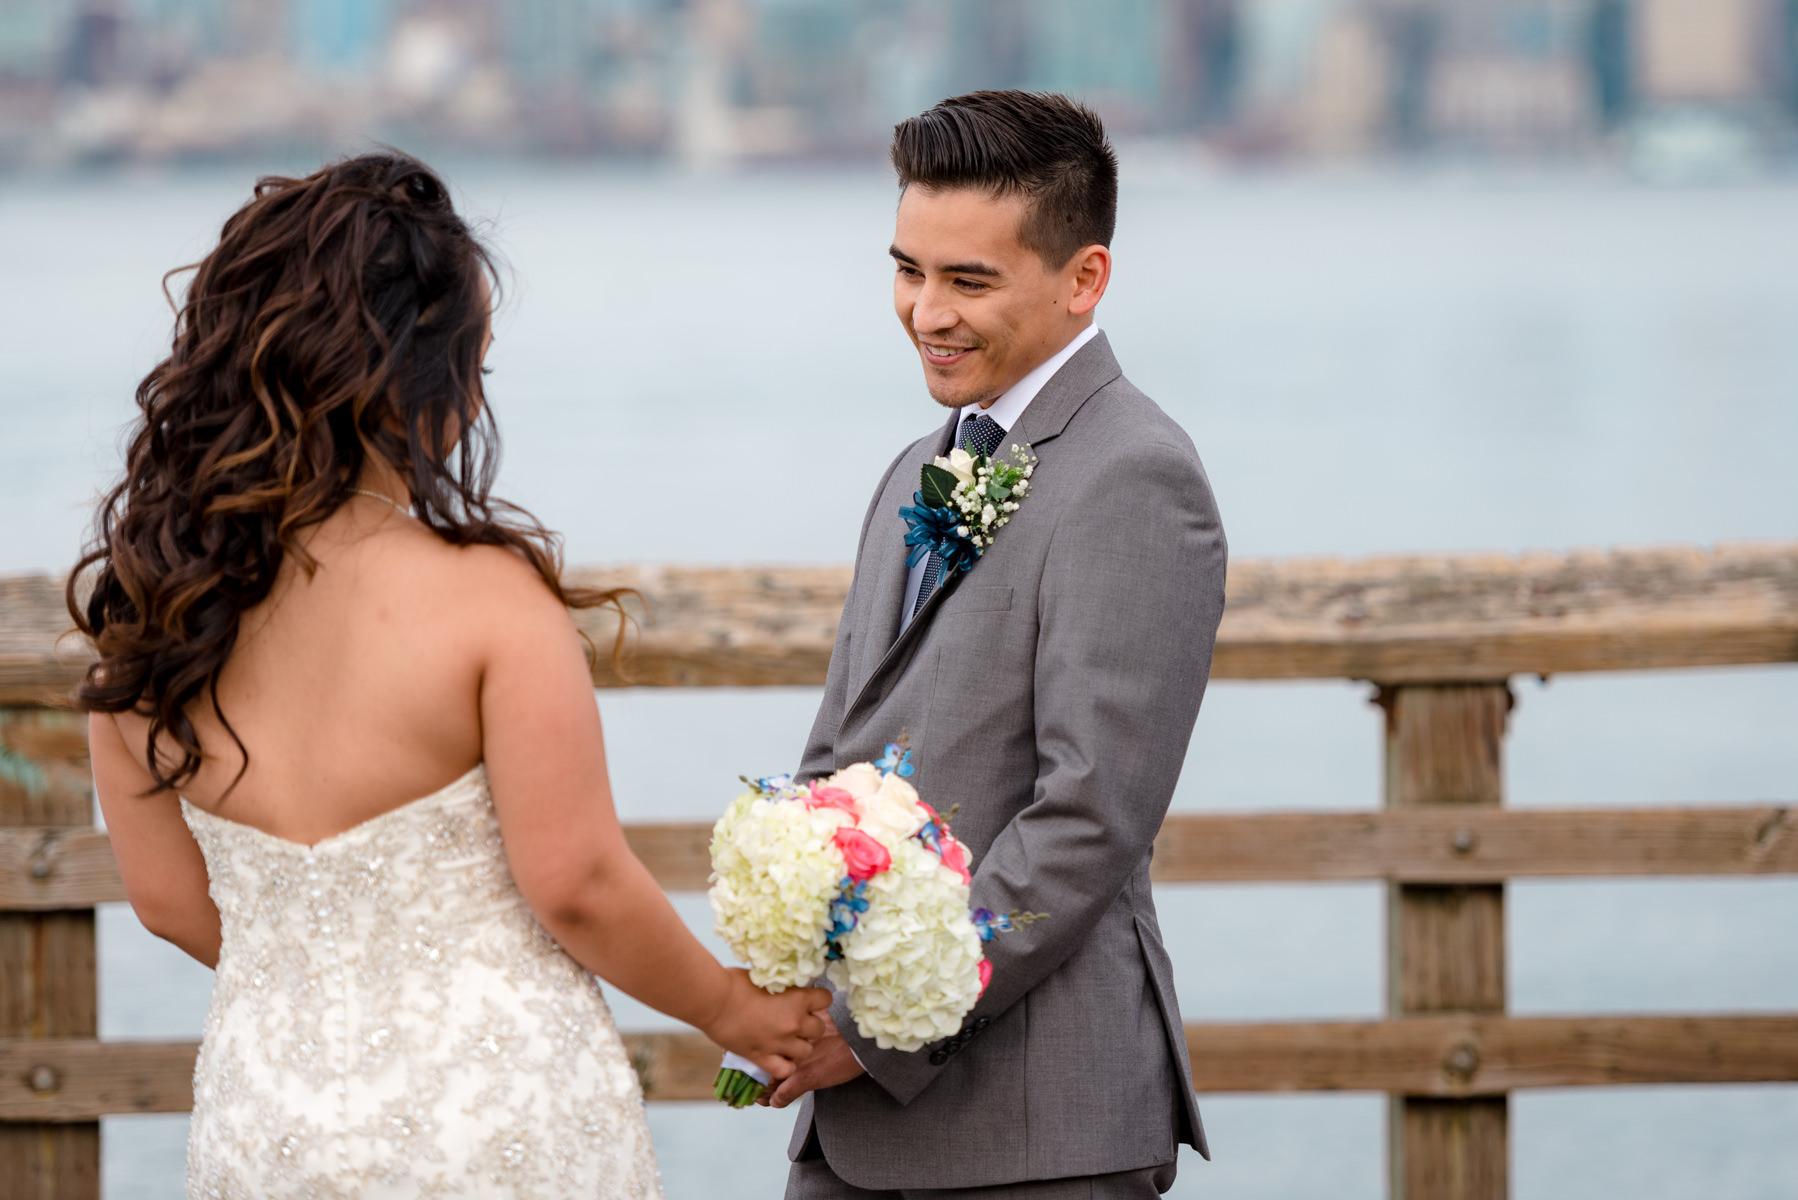 Andrew Tat - Documentary Wedding Photography - Salty's - Seattle, Washington -Mark & Marcy - 02.jpg